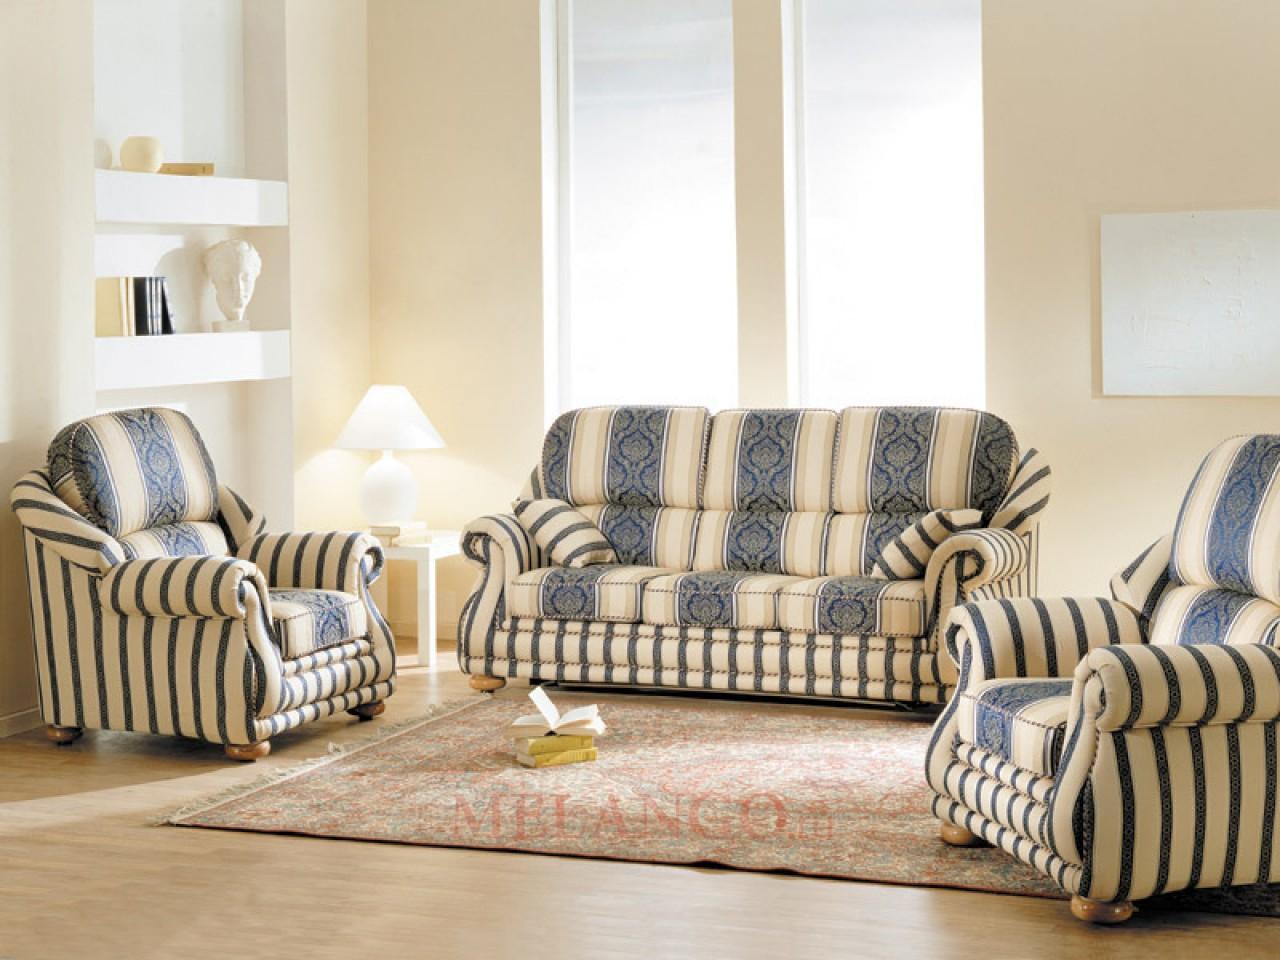 Комплект мягкой мебели Амазонка